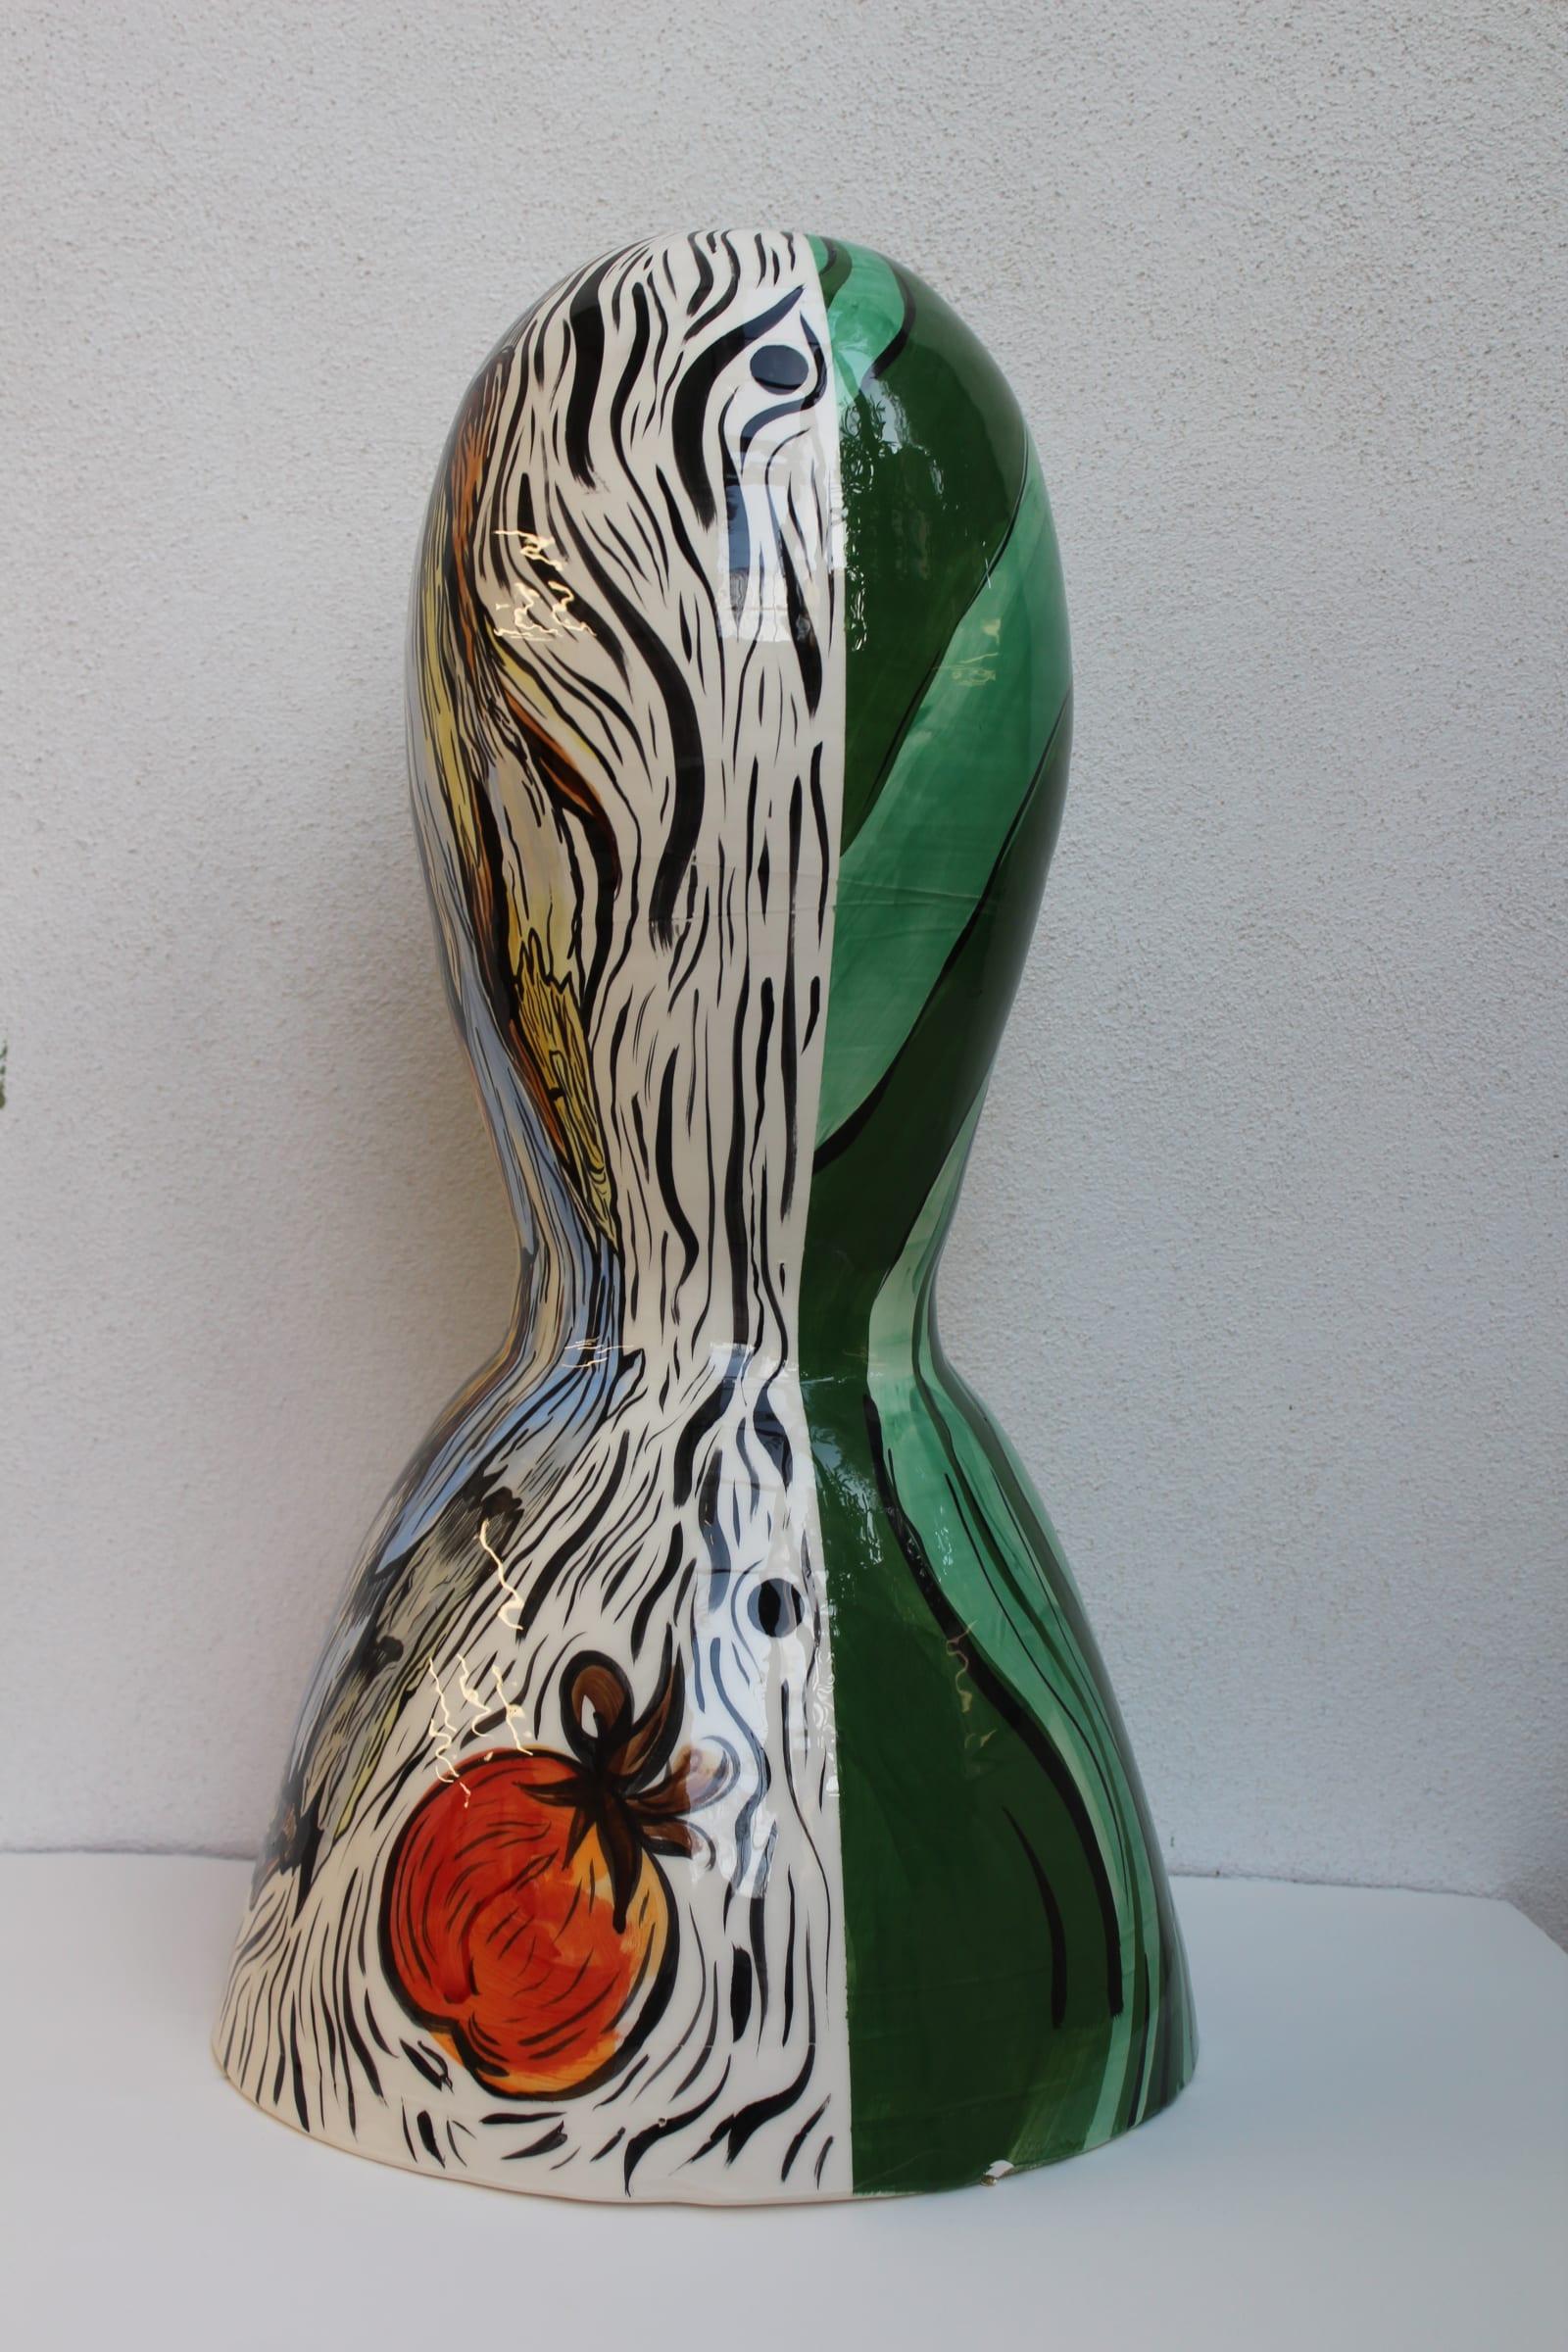 "<span class=""link fancybox-details-link""><a href=""/artists/51-florentine-%26-alexandre-lamarche-ovize/works/11925/"">View Detail Page</a></span><div class=""artist""><strong>Florentine & Alexandre LAMARCHE-OVIZE</strong></div> <div class=""title""><em>Ceramic doll (after Girard) #4</em>, 2020</div> <div class=""medium"">glazed ceramic</div> <div class=""dimensions"">70 x 30 x 30 cm<br /> 27 1/2 x 11 3/4 x 11 3/4 in</div><div class=""copyright_line"">Copyright The Artist</div>"